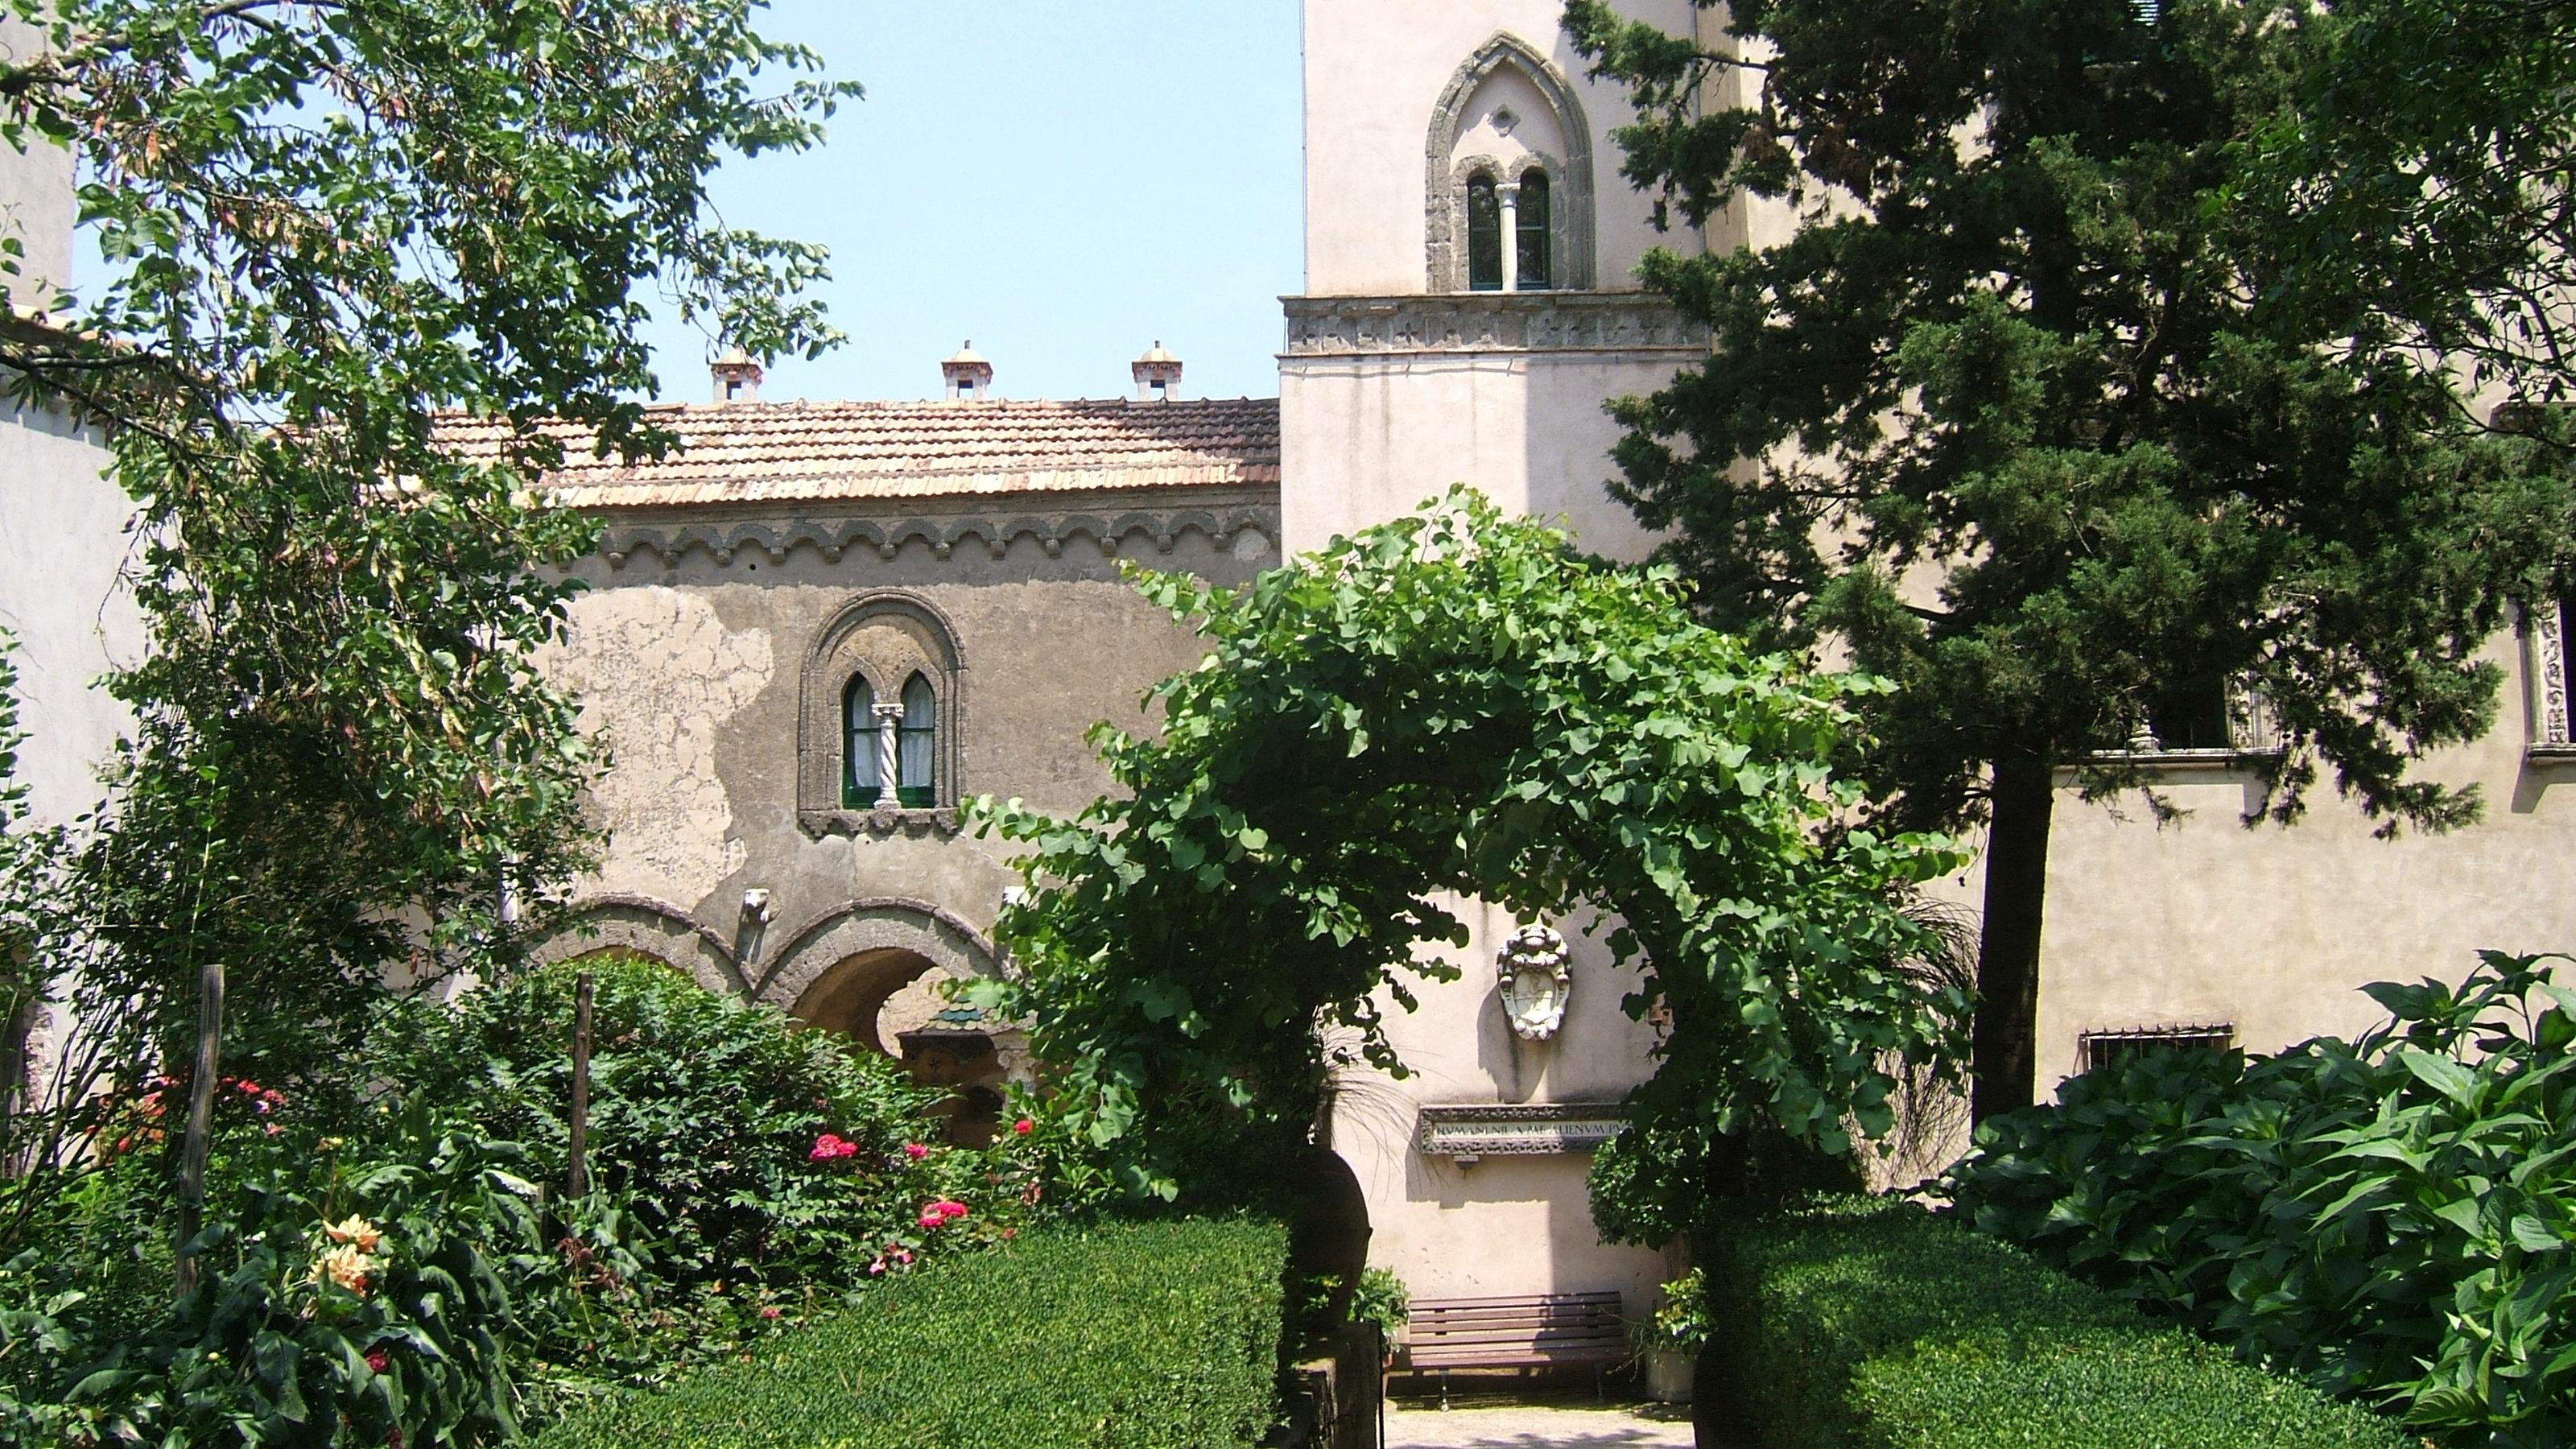 http://upload.wikimedia.org/wikipedia/en/3/33/Villa_cimbrone_exterior.jpg